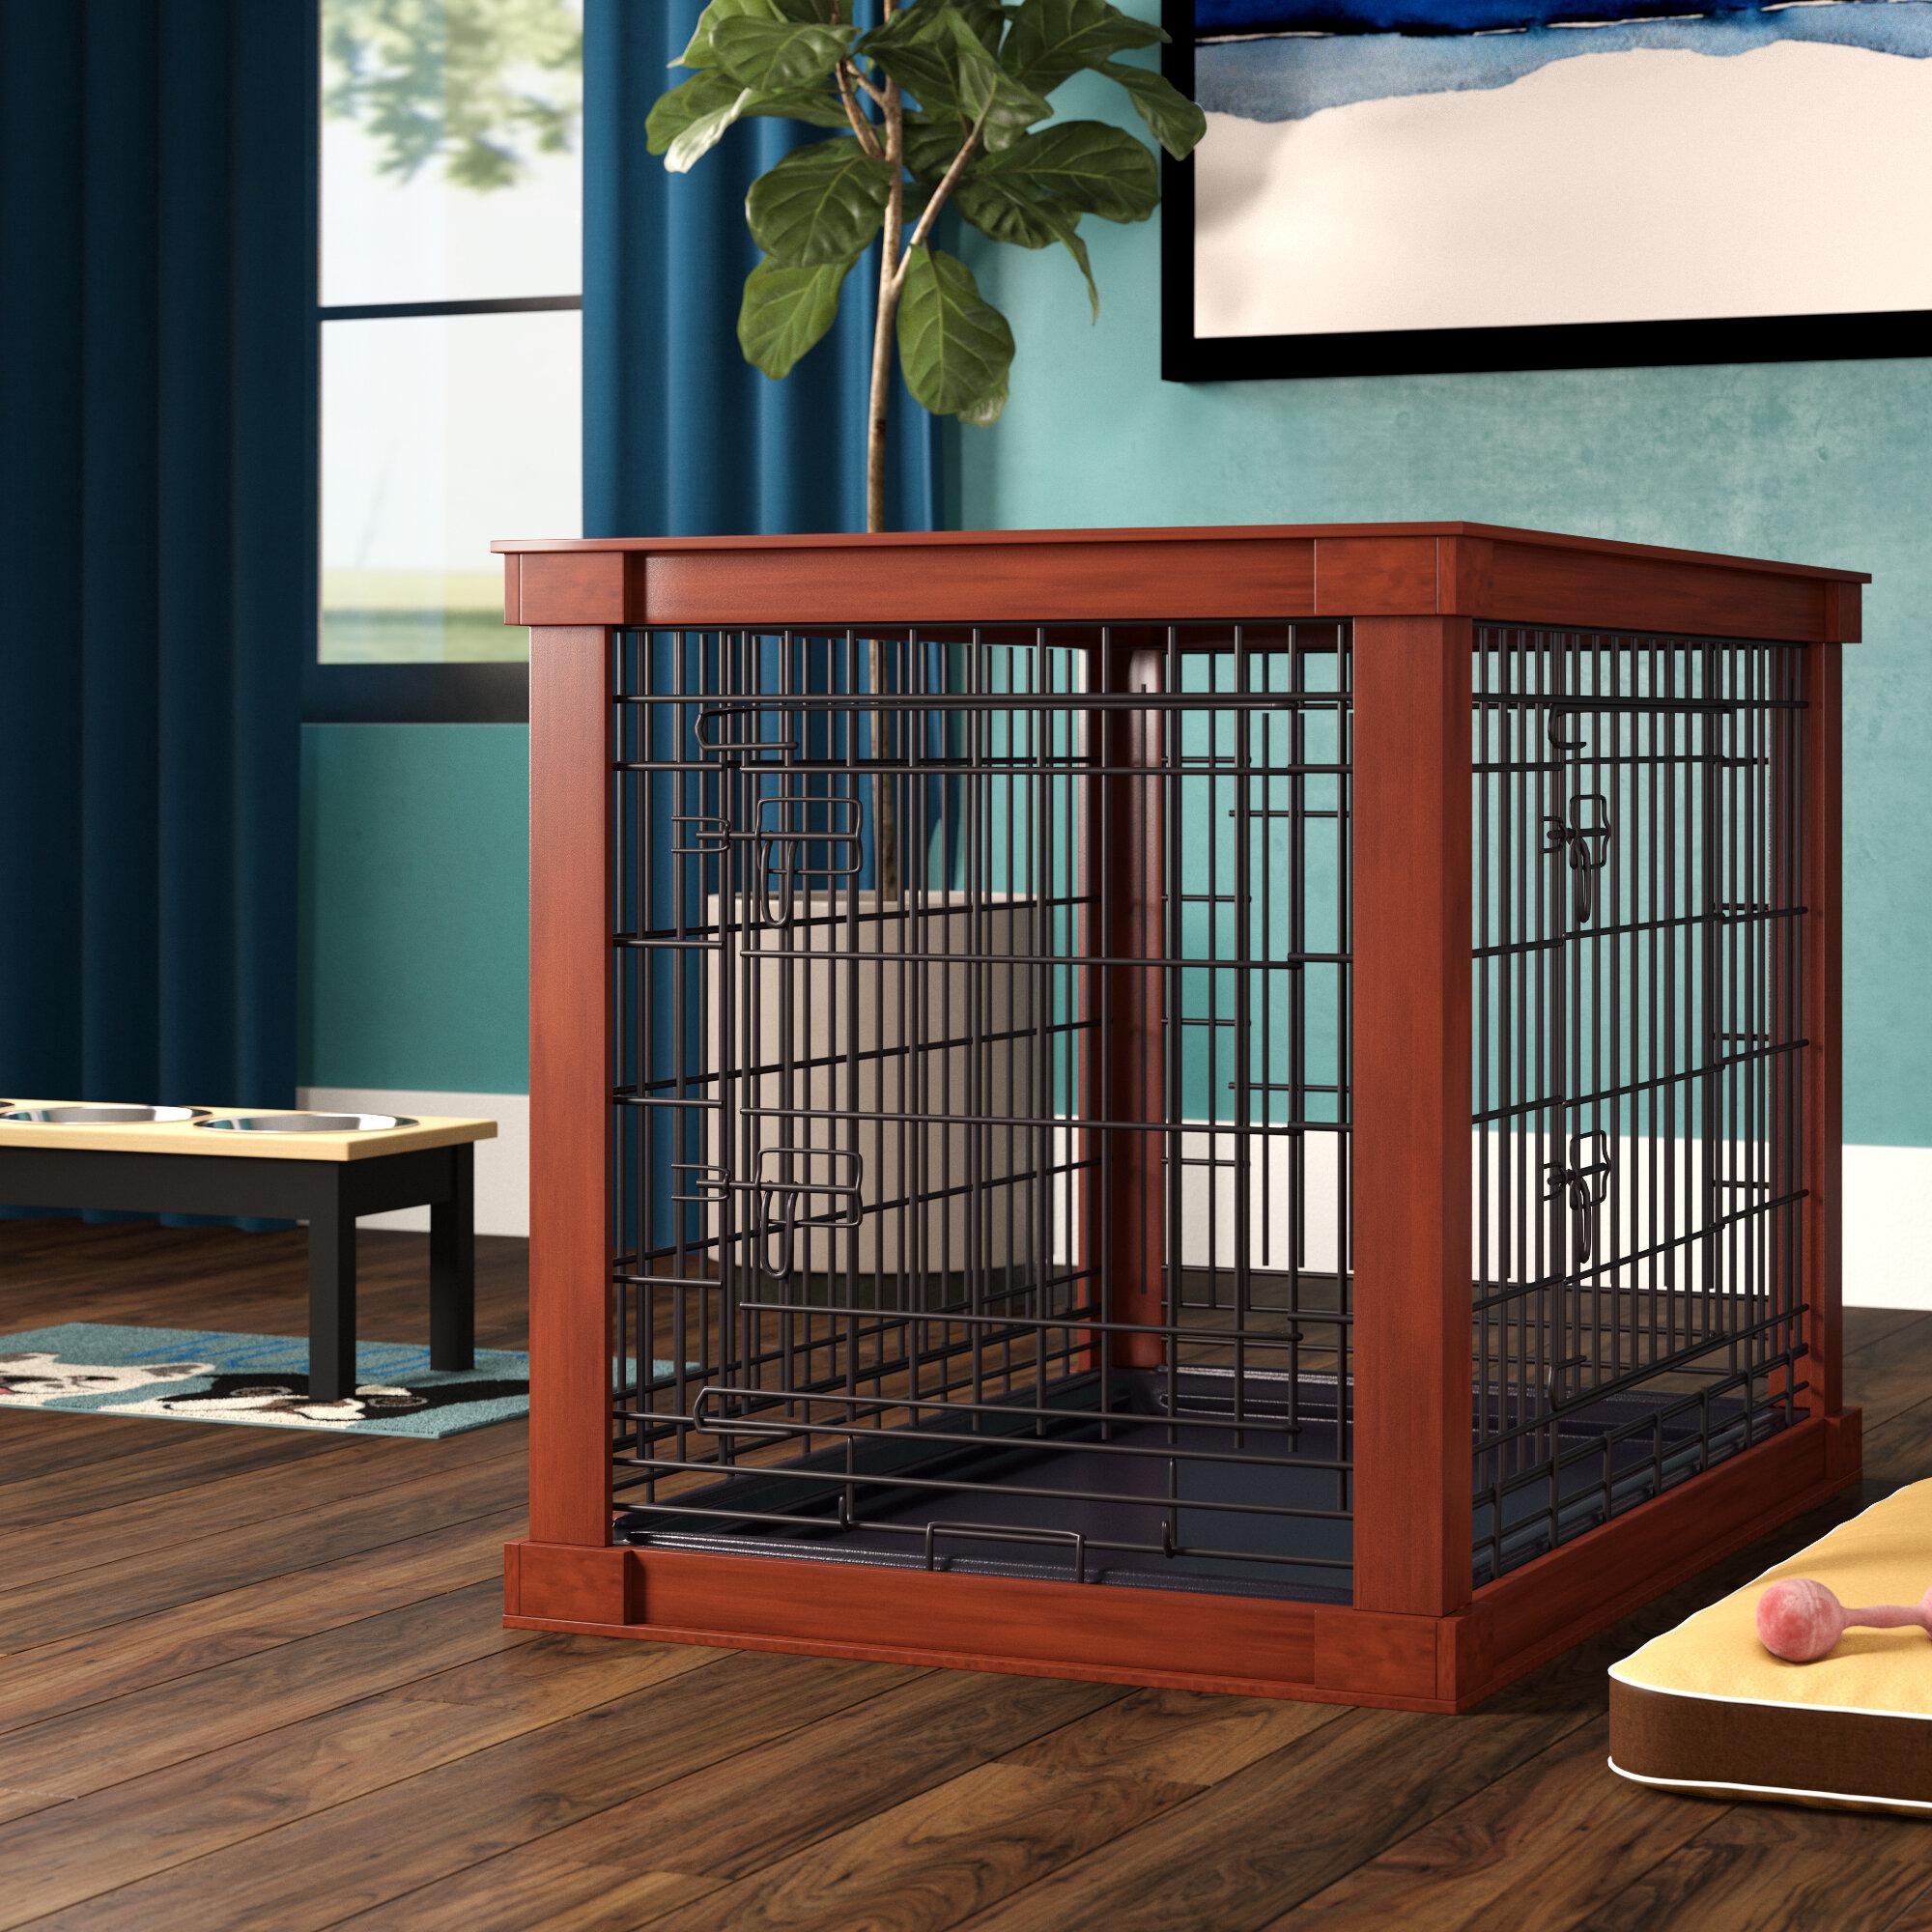 Archie & Oscar 'Ansel' Deluxe Pet Crate via Wayfair